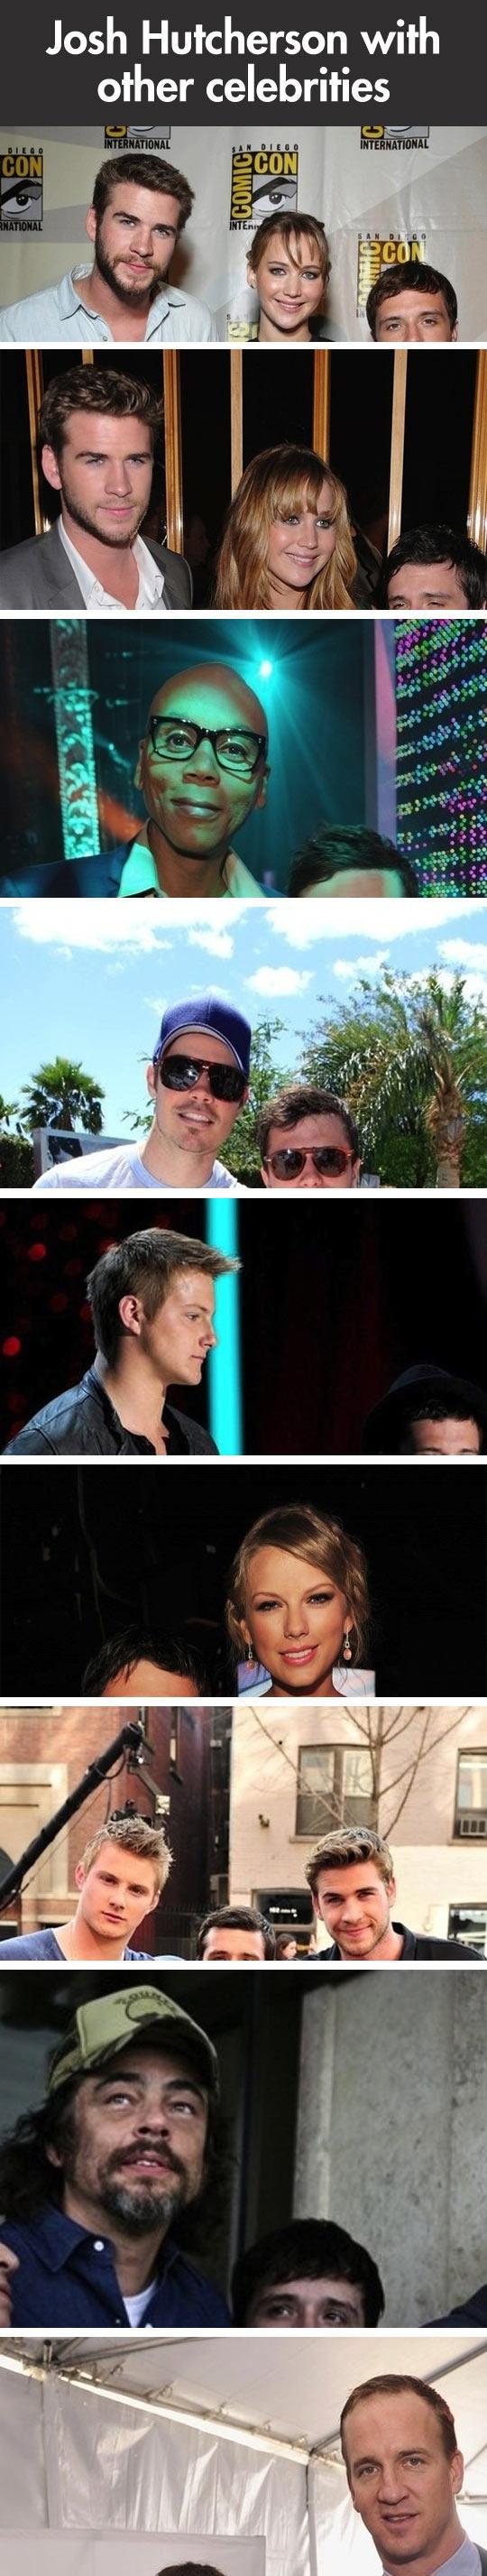 cool-Josh-Hutcherson-short-celebrities